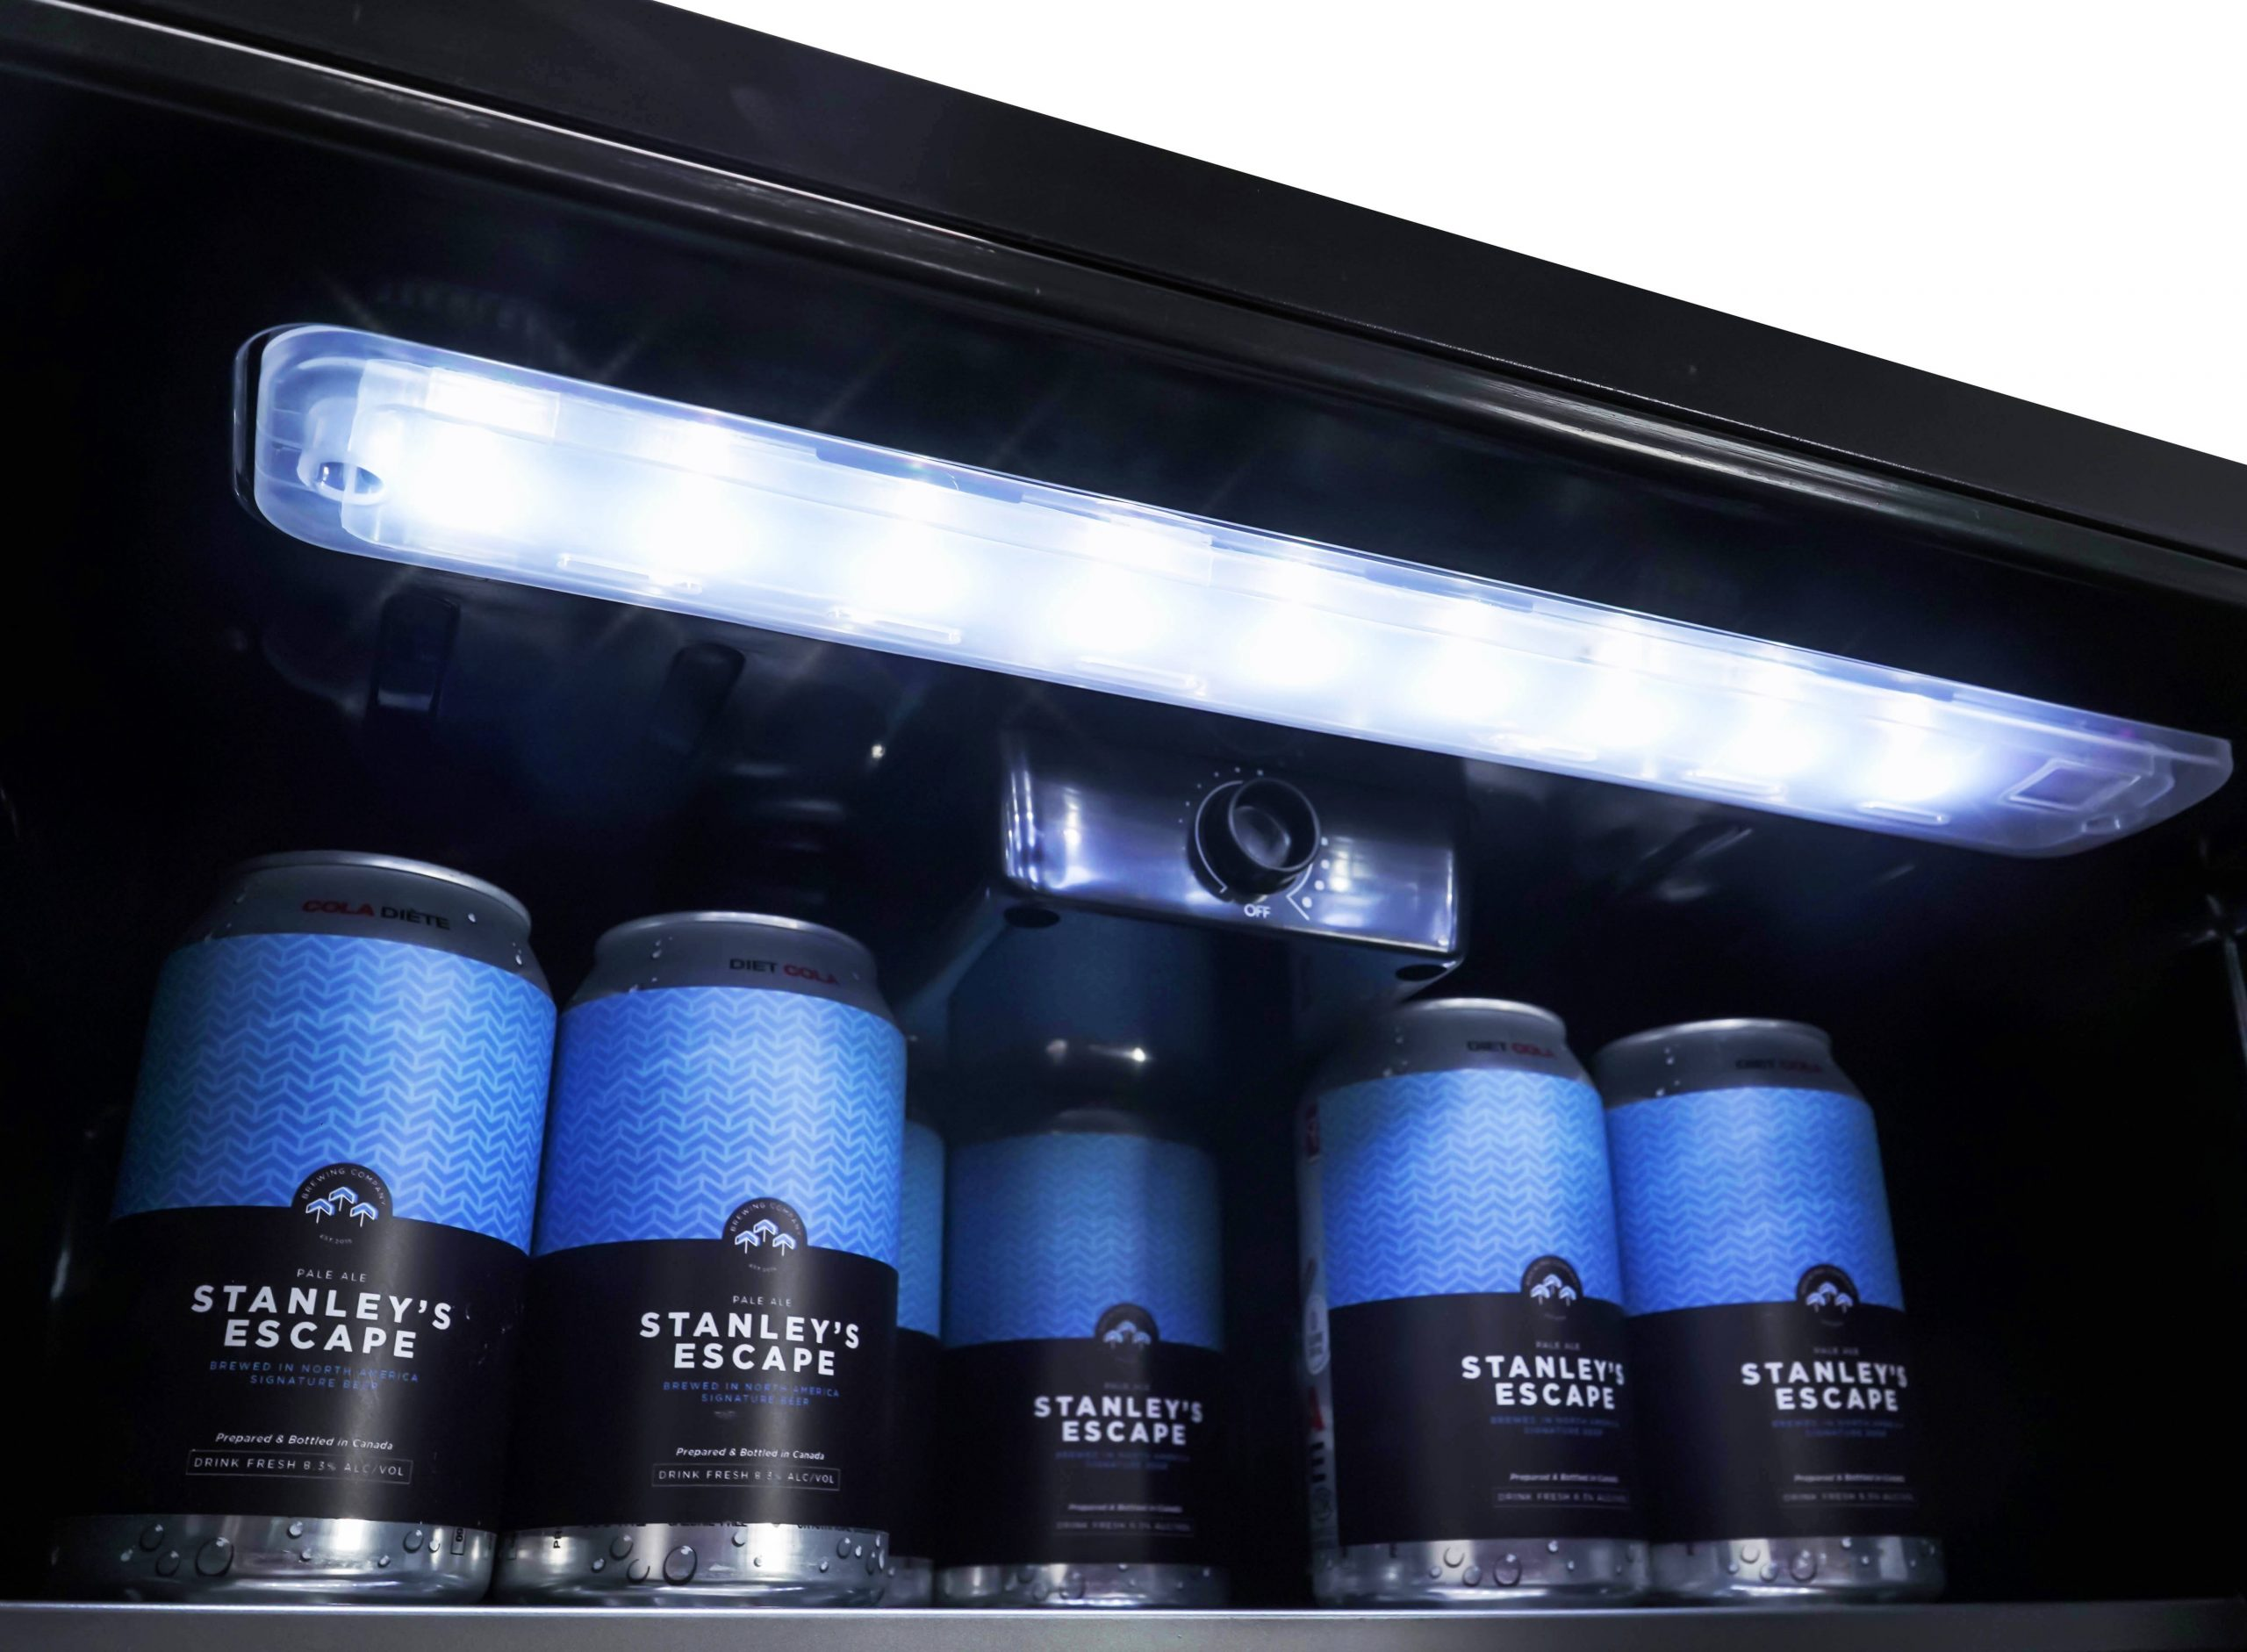 4.4 cu. ft. Freestanding Stainless Steel Outdoor Refrigerator